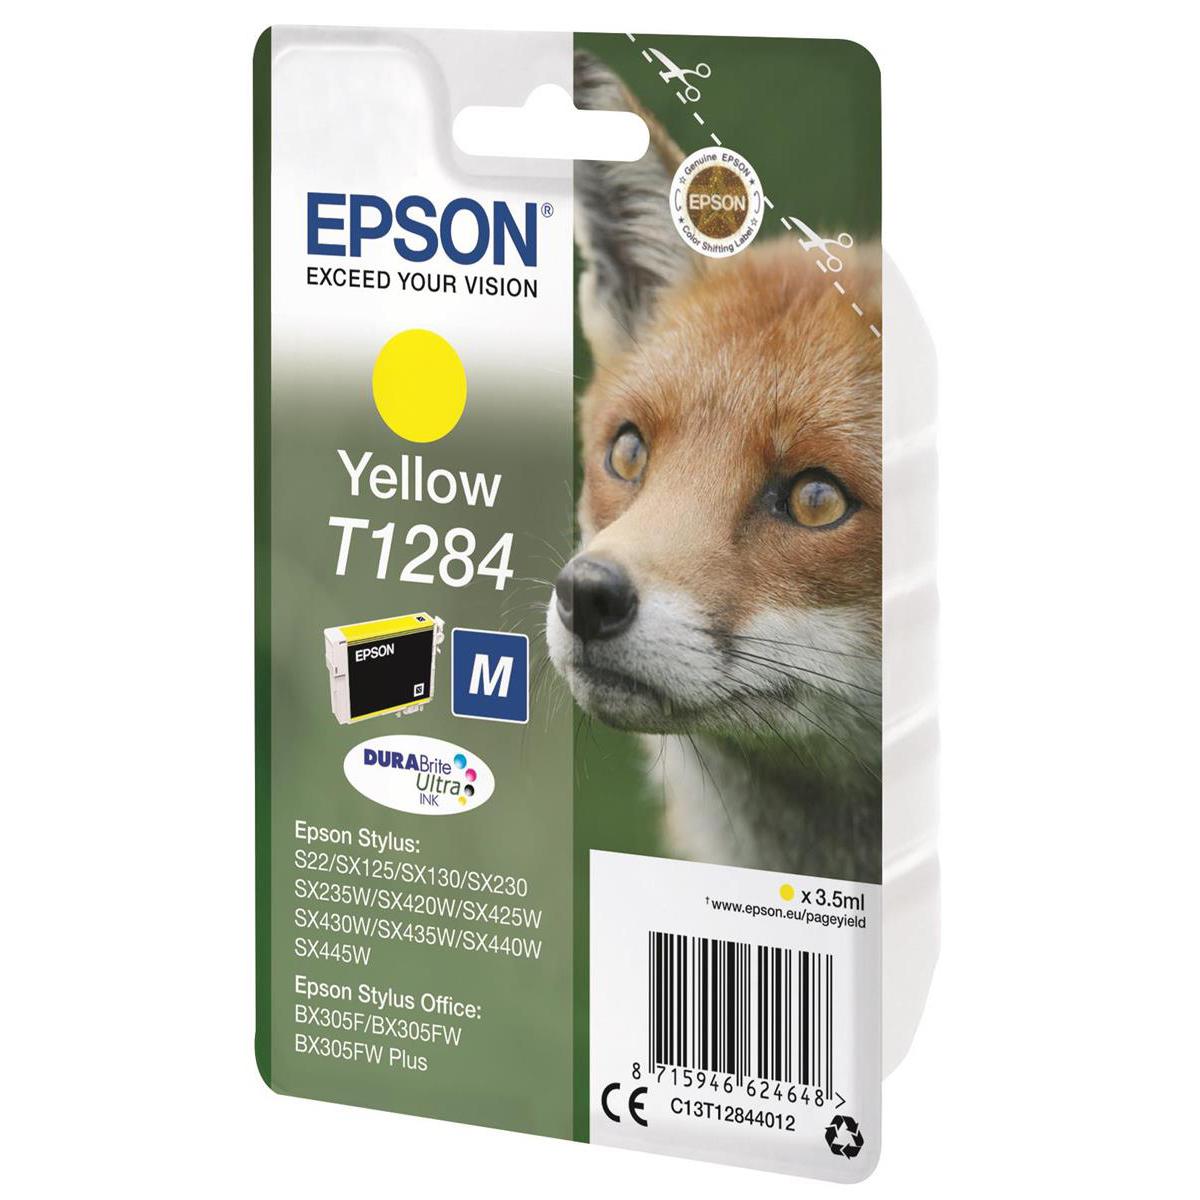 Epson T1284 Inkjet Cartridge Fox Page Life 230pp 3.5ml Yellow Ref C13T12844012